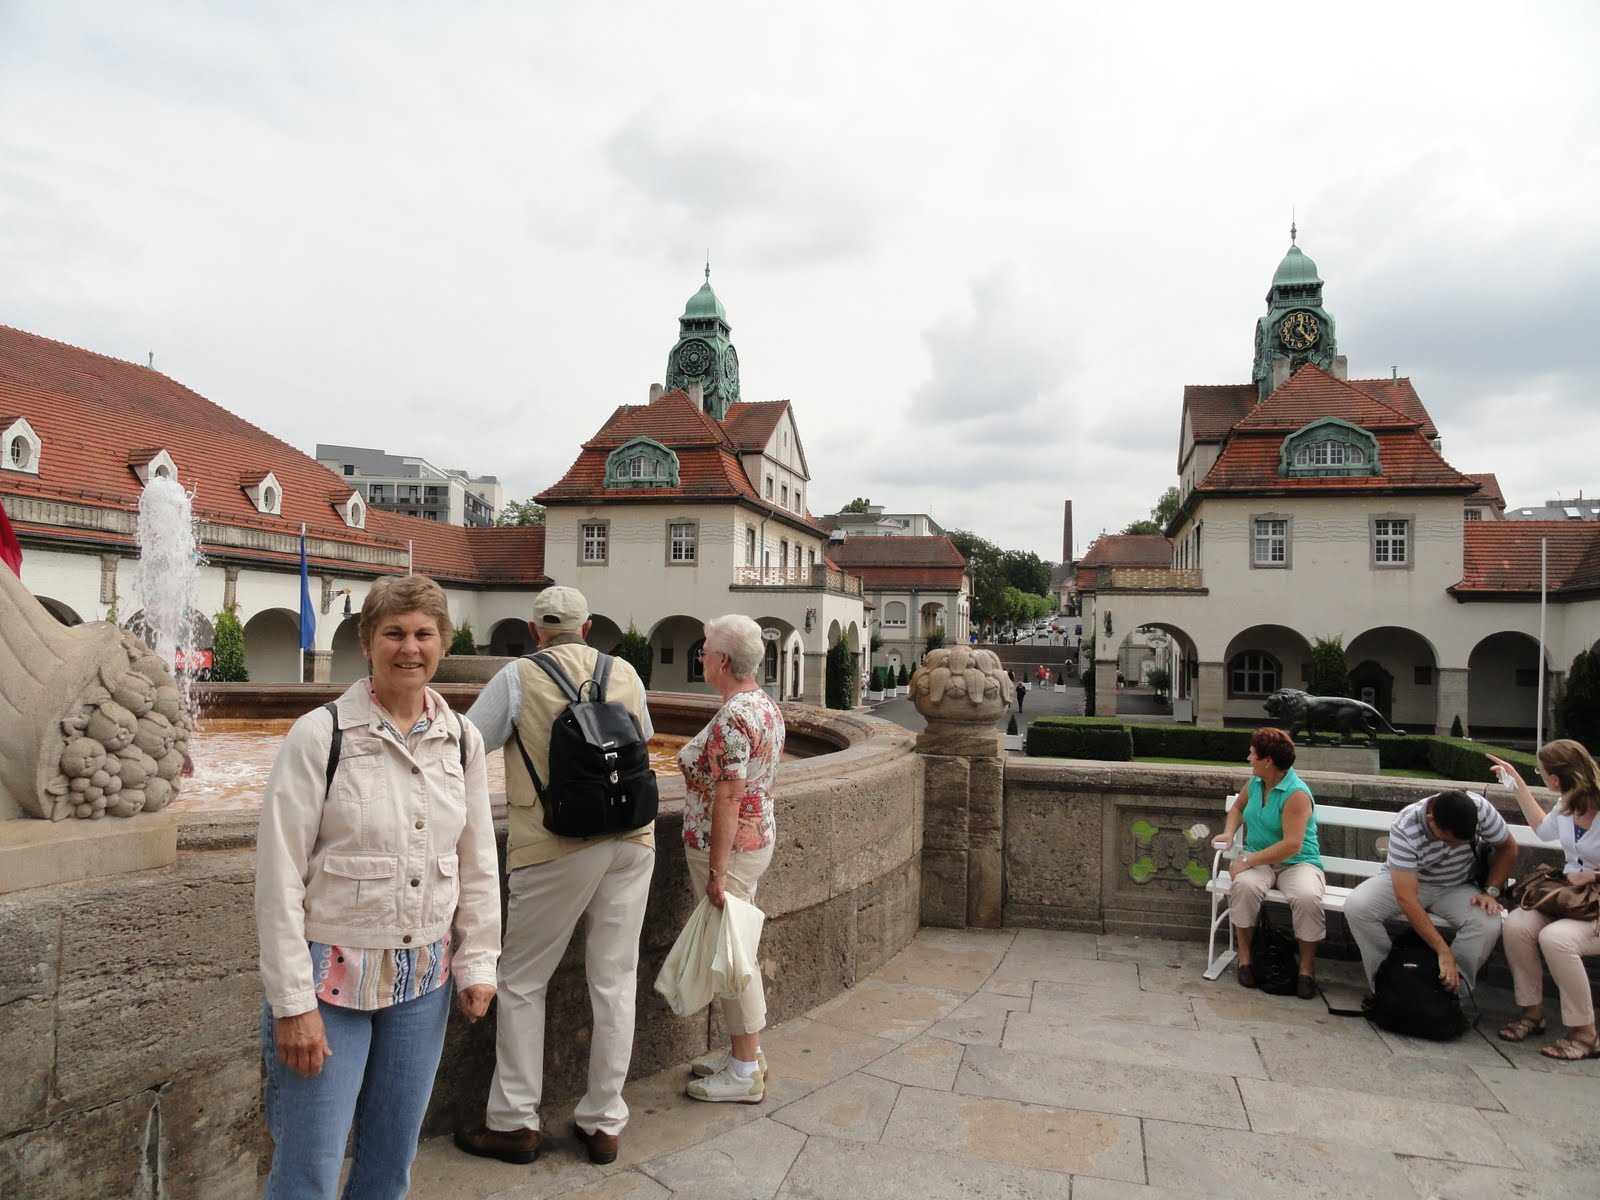 Flohrs in Frankfurt: Bad Nauheim - Elvis and Health Spas